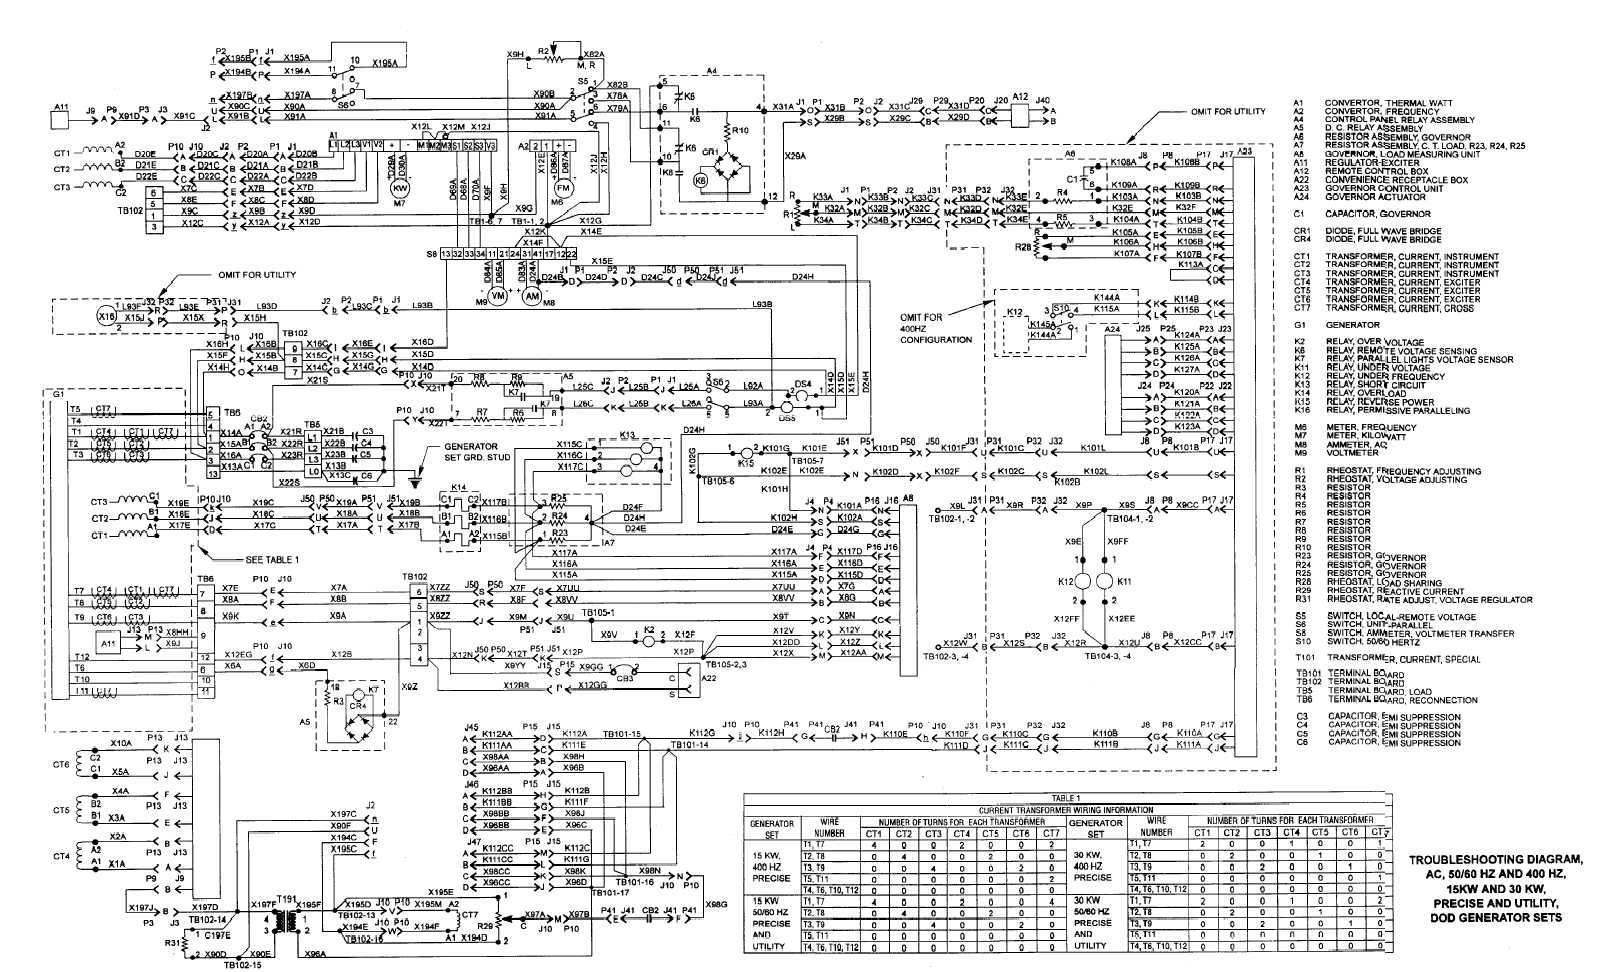 fo 8 ac troubleshooting diagram rh dieselgenerators tpub com